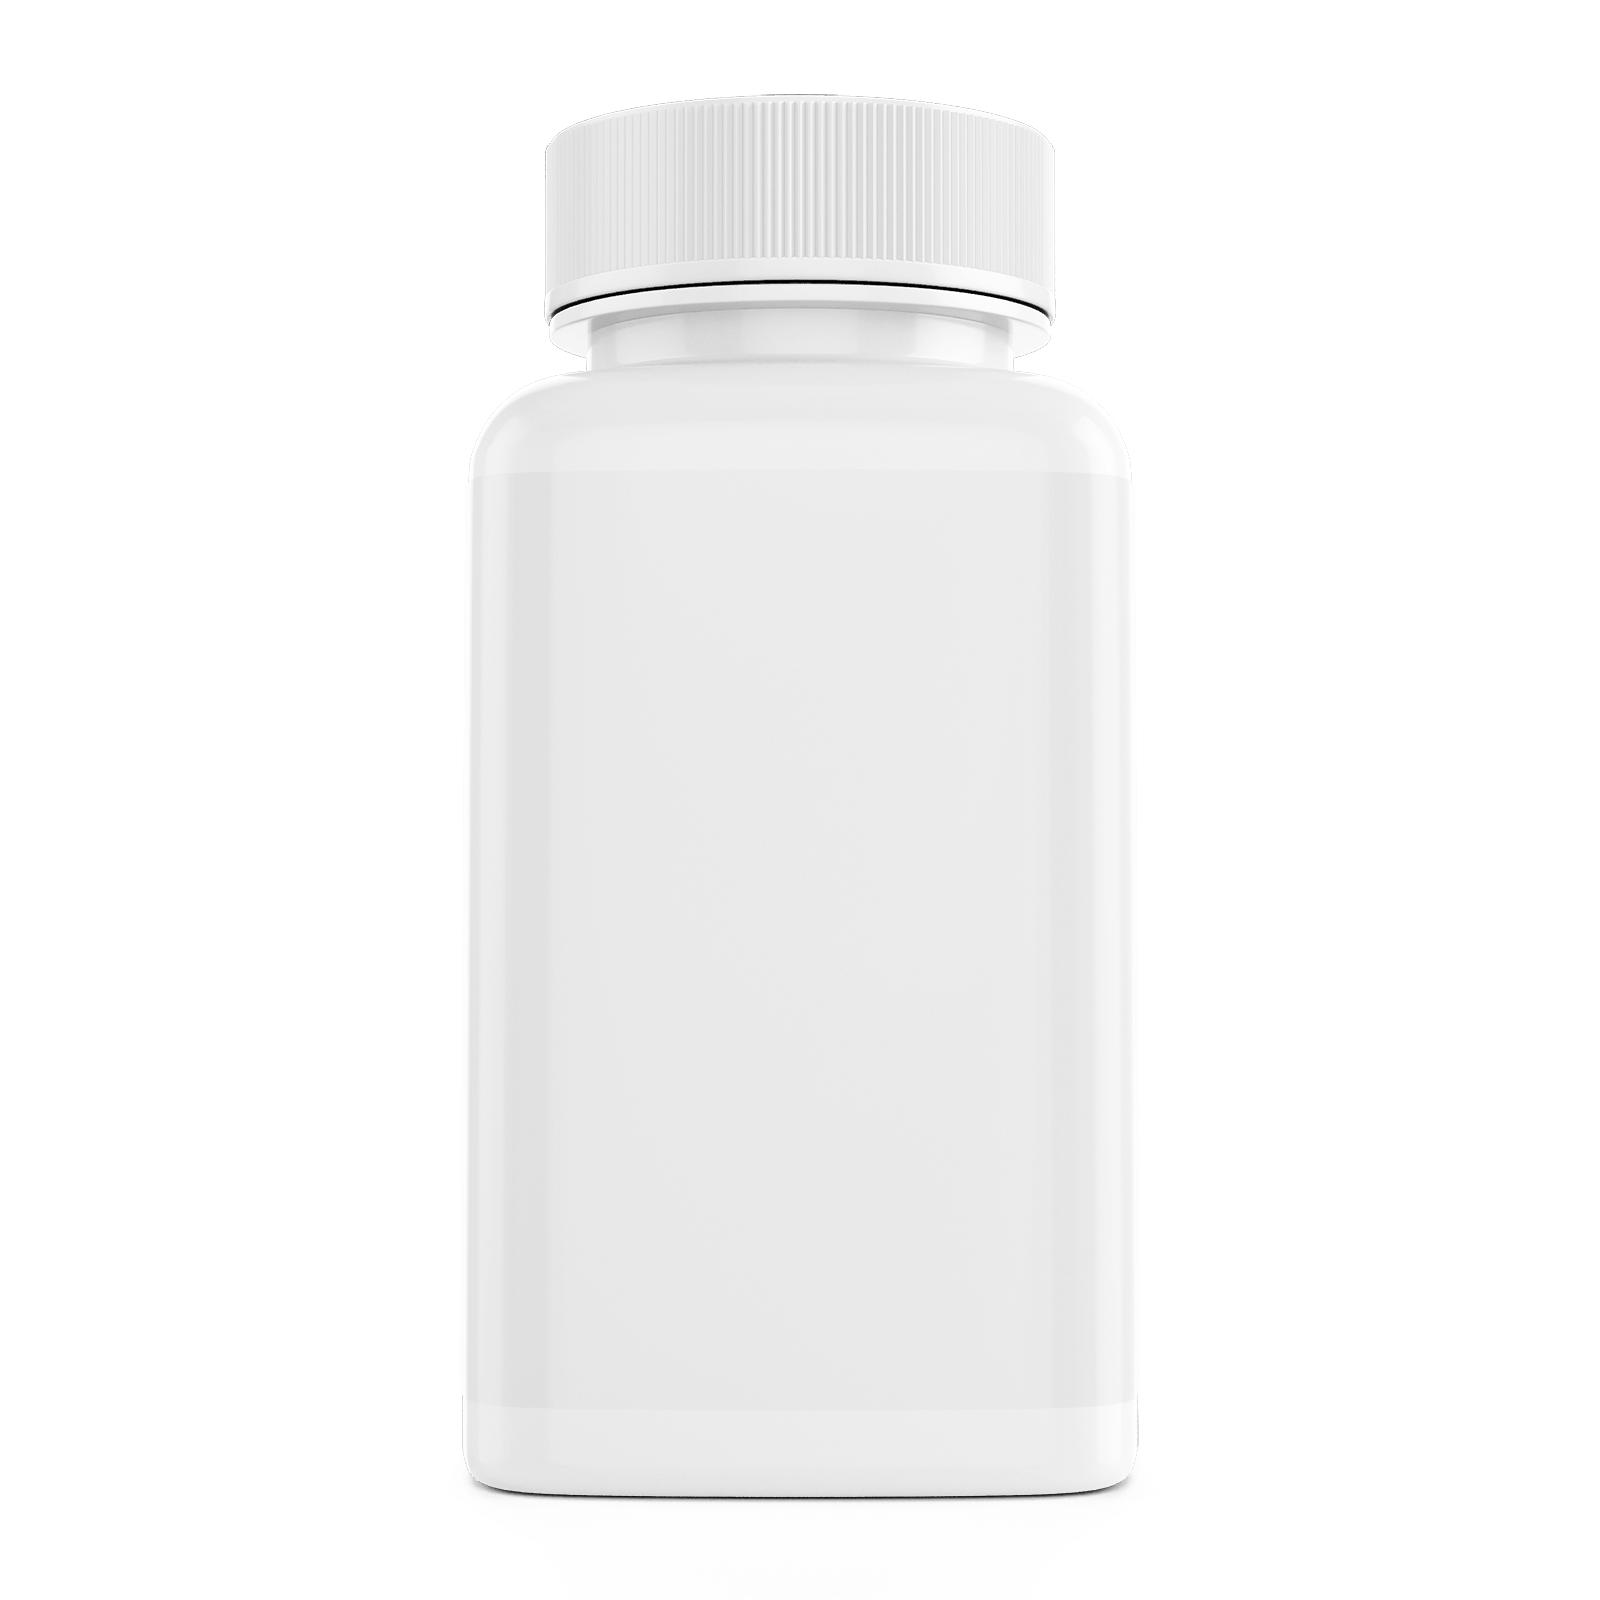 Free Dietary Supplement Pills Bottle Mockup